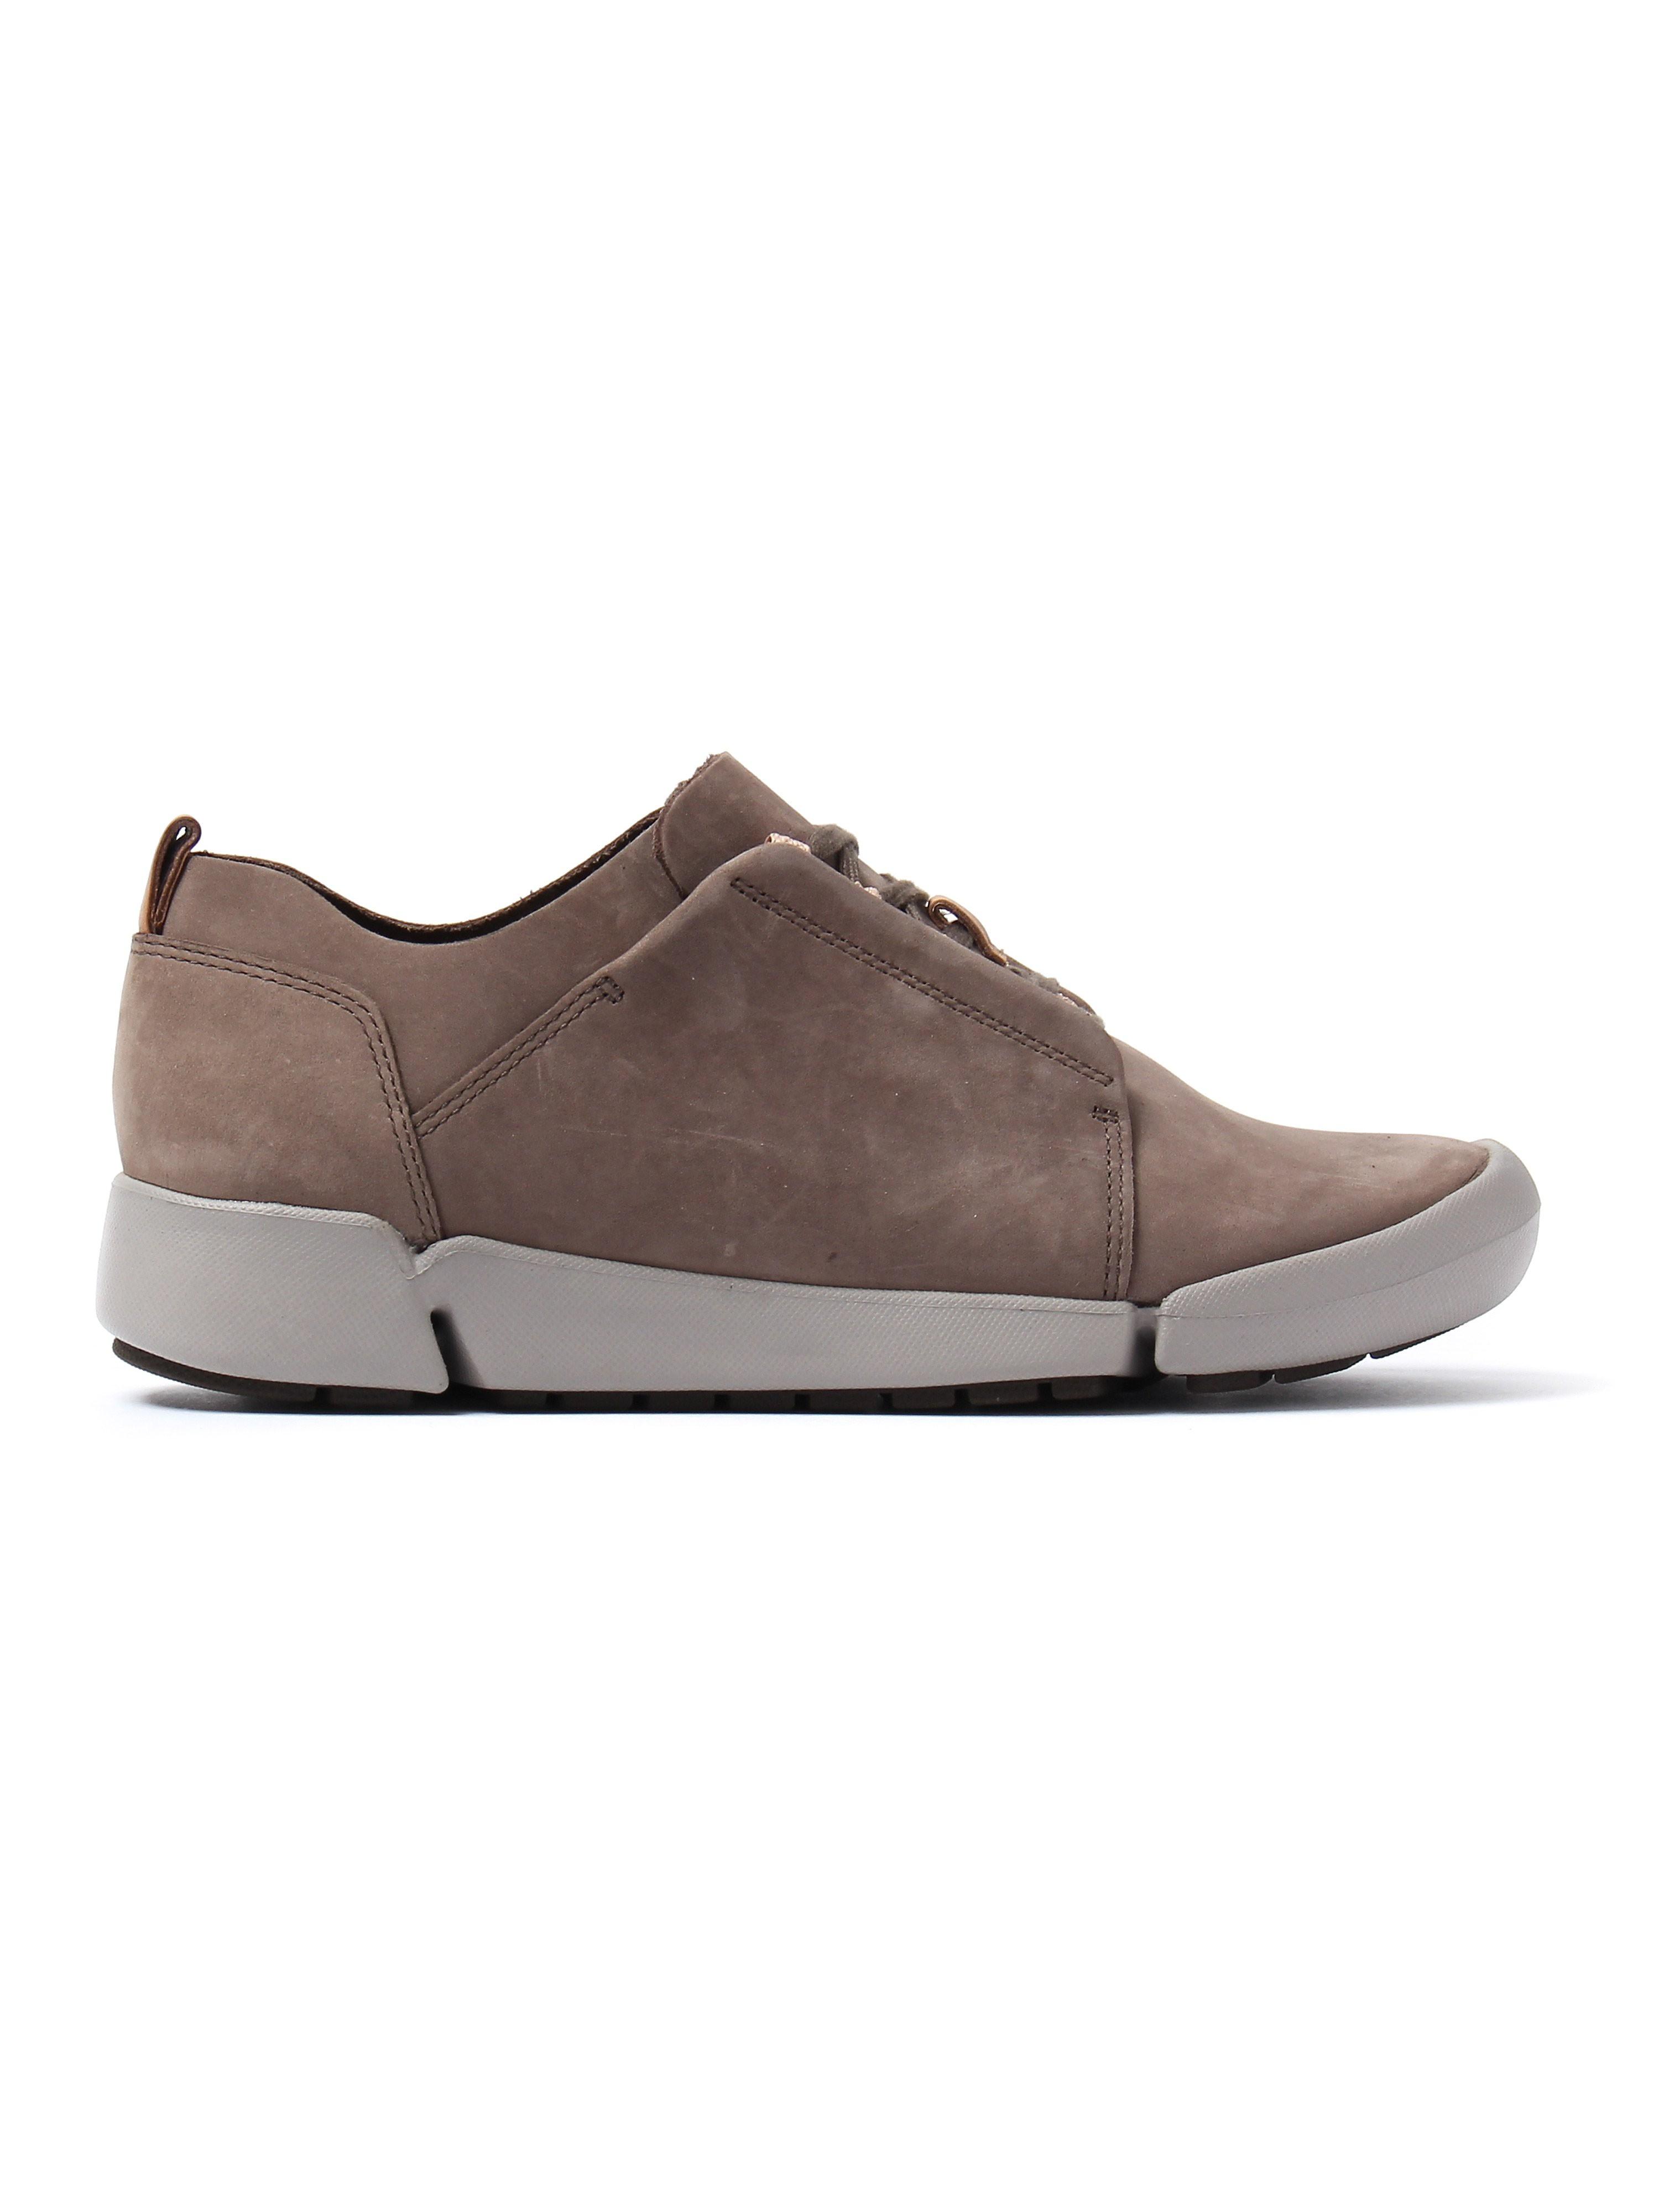 Clarks Women's Tri Bella Shoes - Grey Nubuck